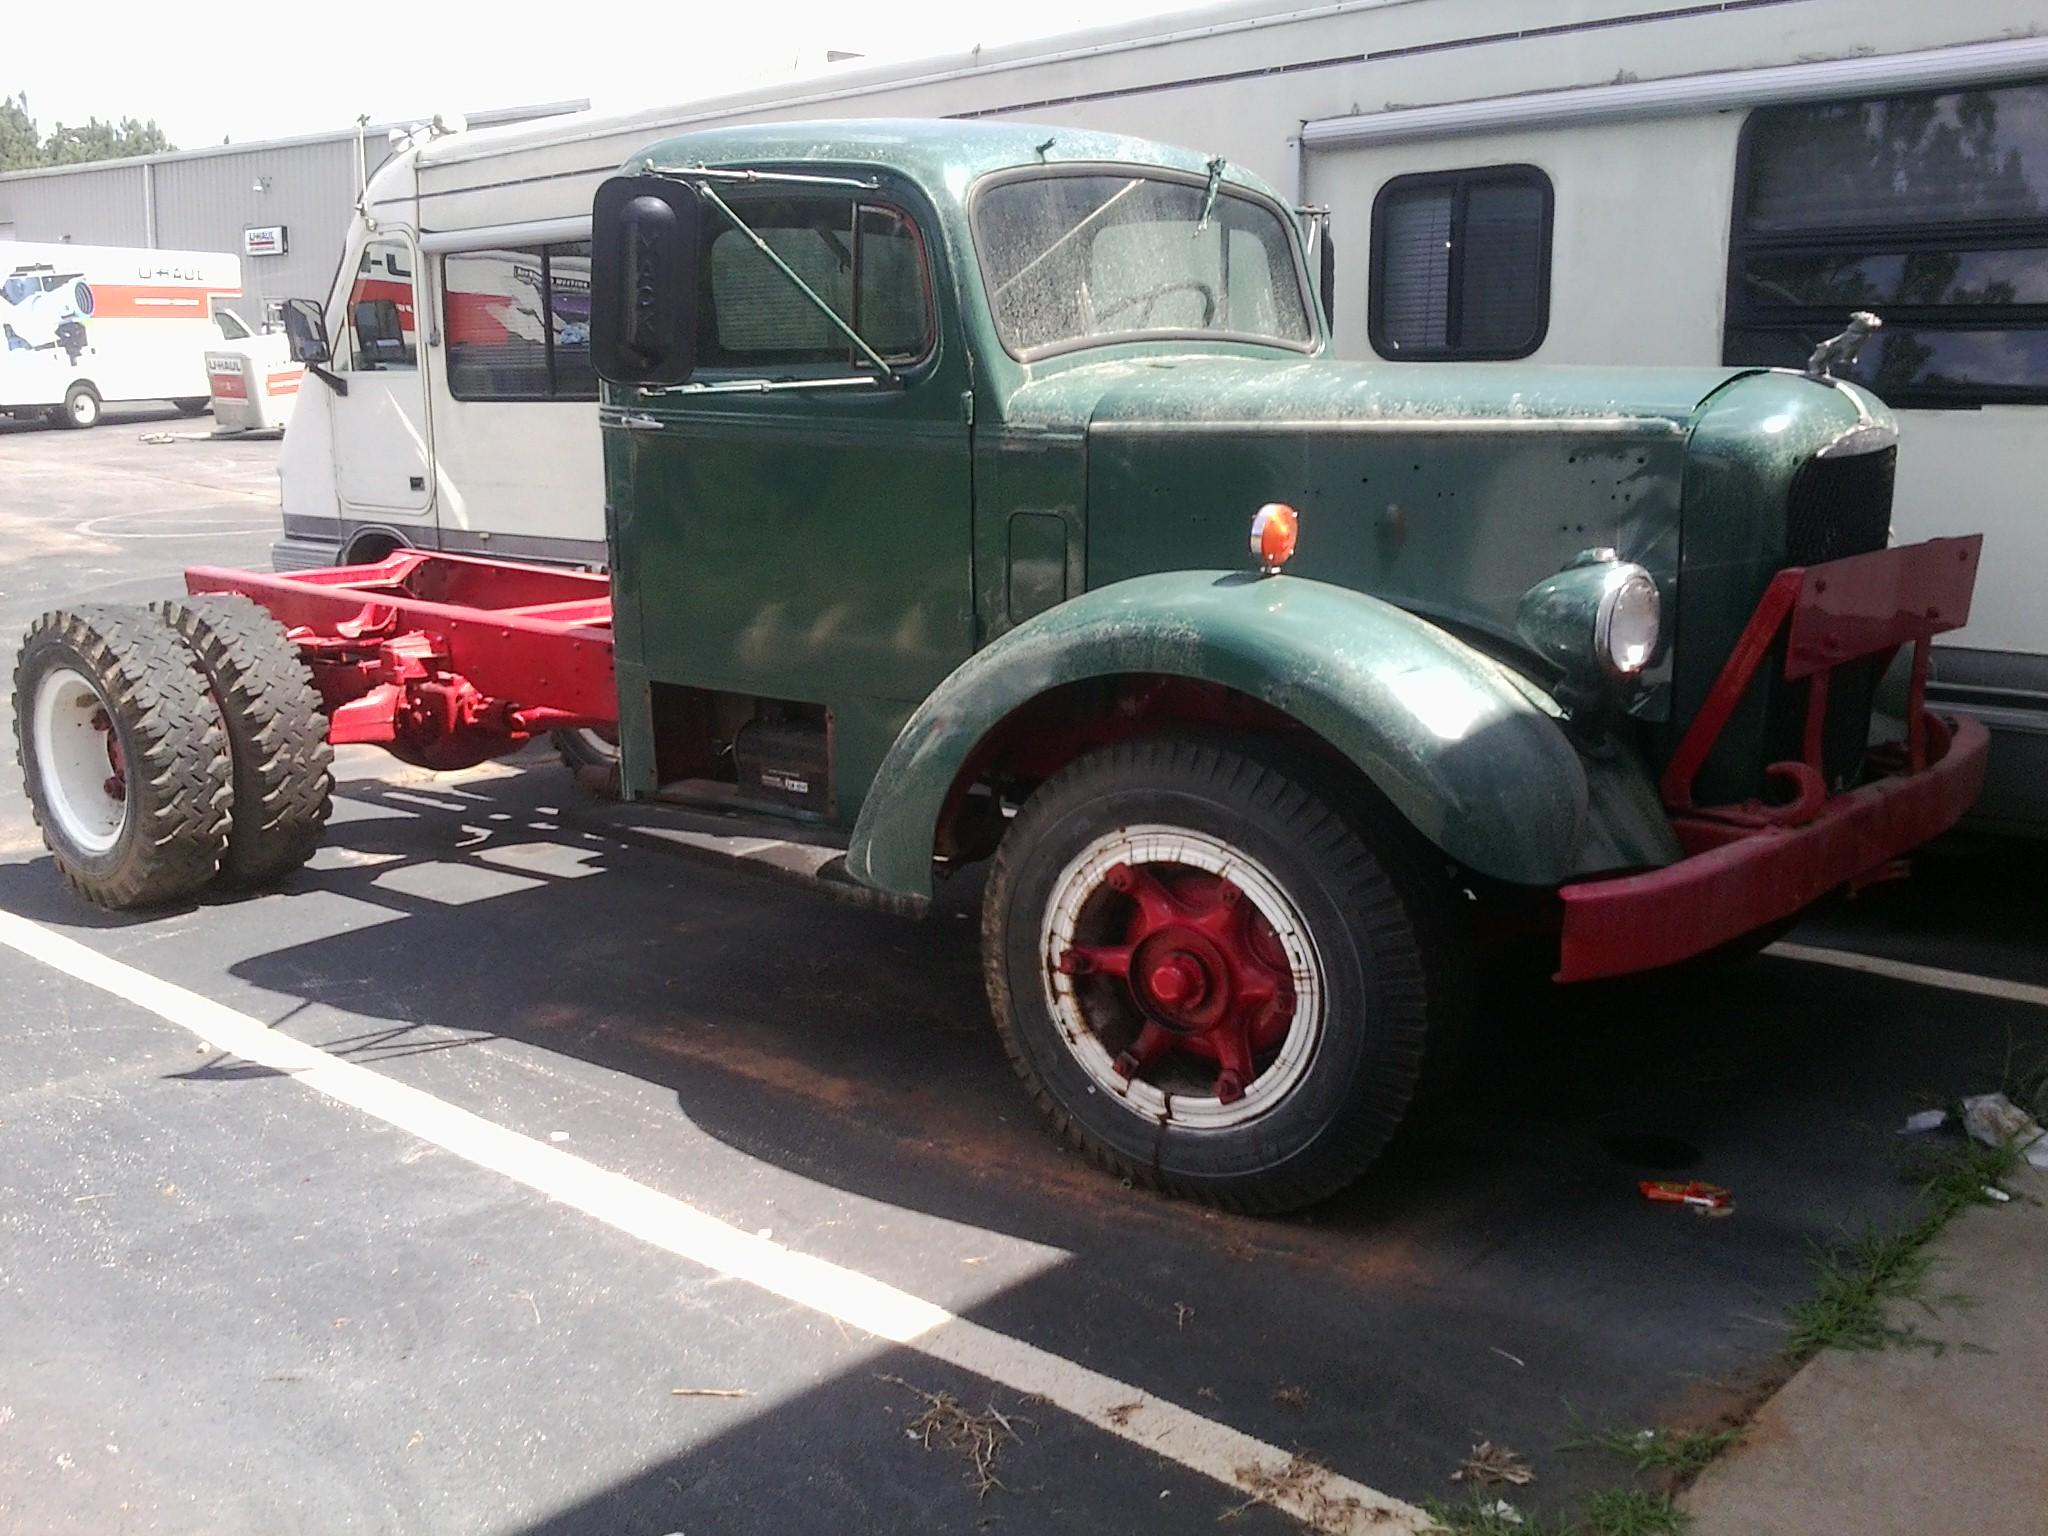 1950 Mack ? - Trucks for Sale - BigMackTrucks.com